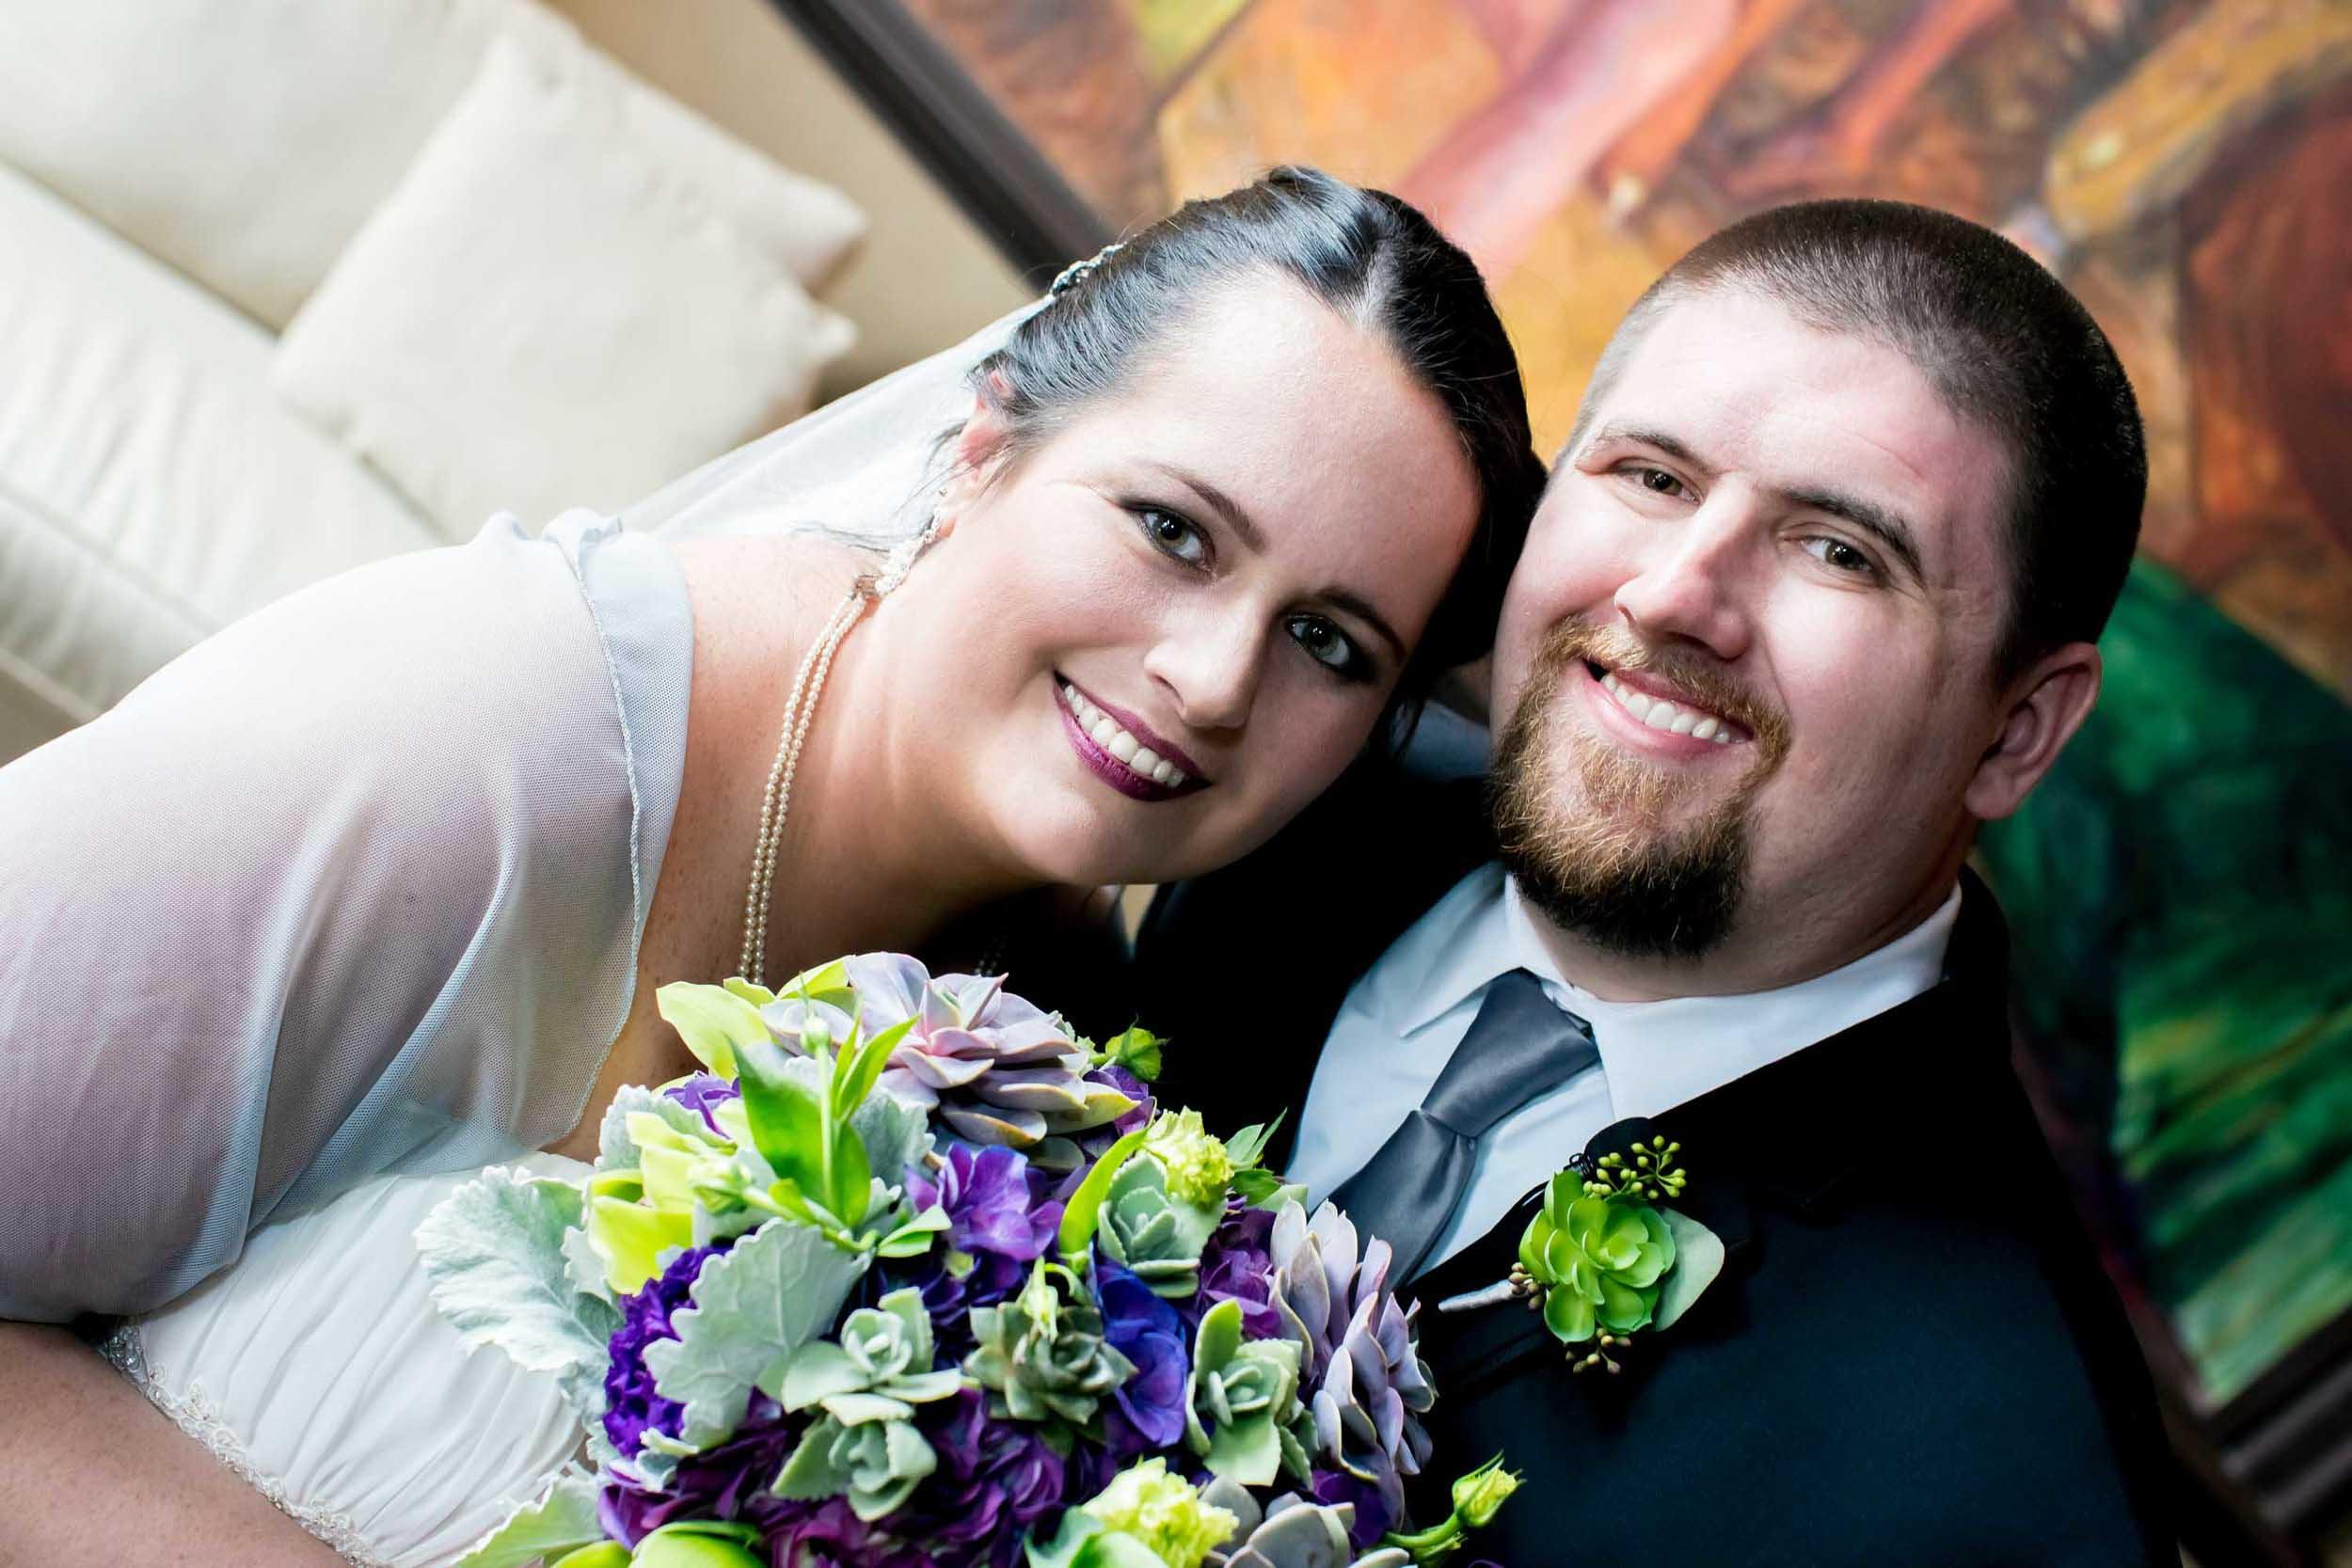 dc+metro+wedding+photographer+vadym+guliuk+photography+wedding+bride+and+groom-2048.jpg